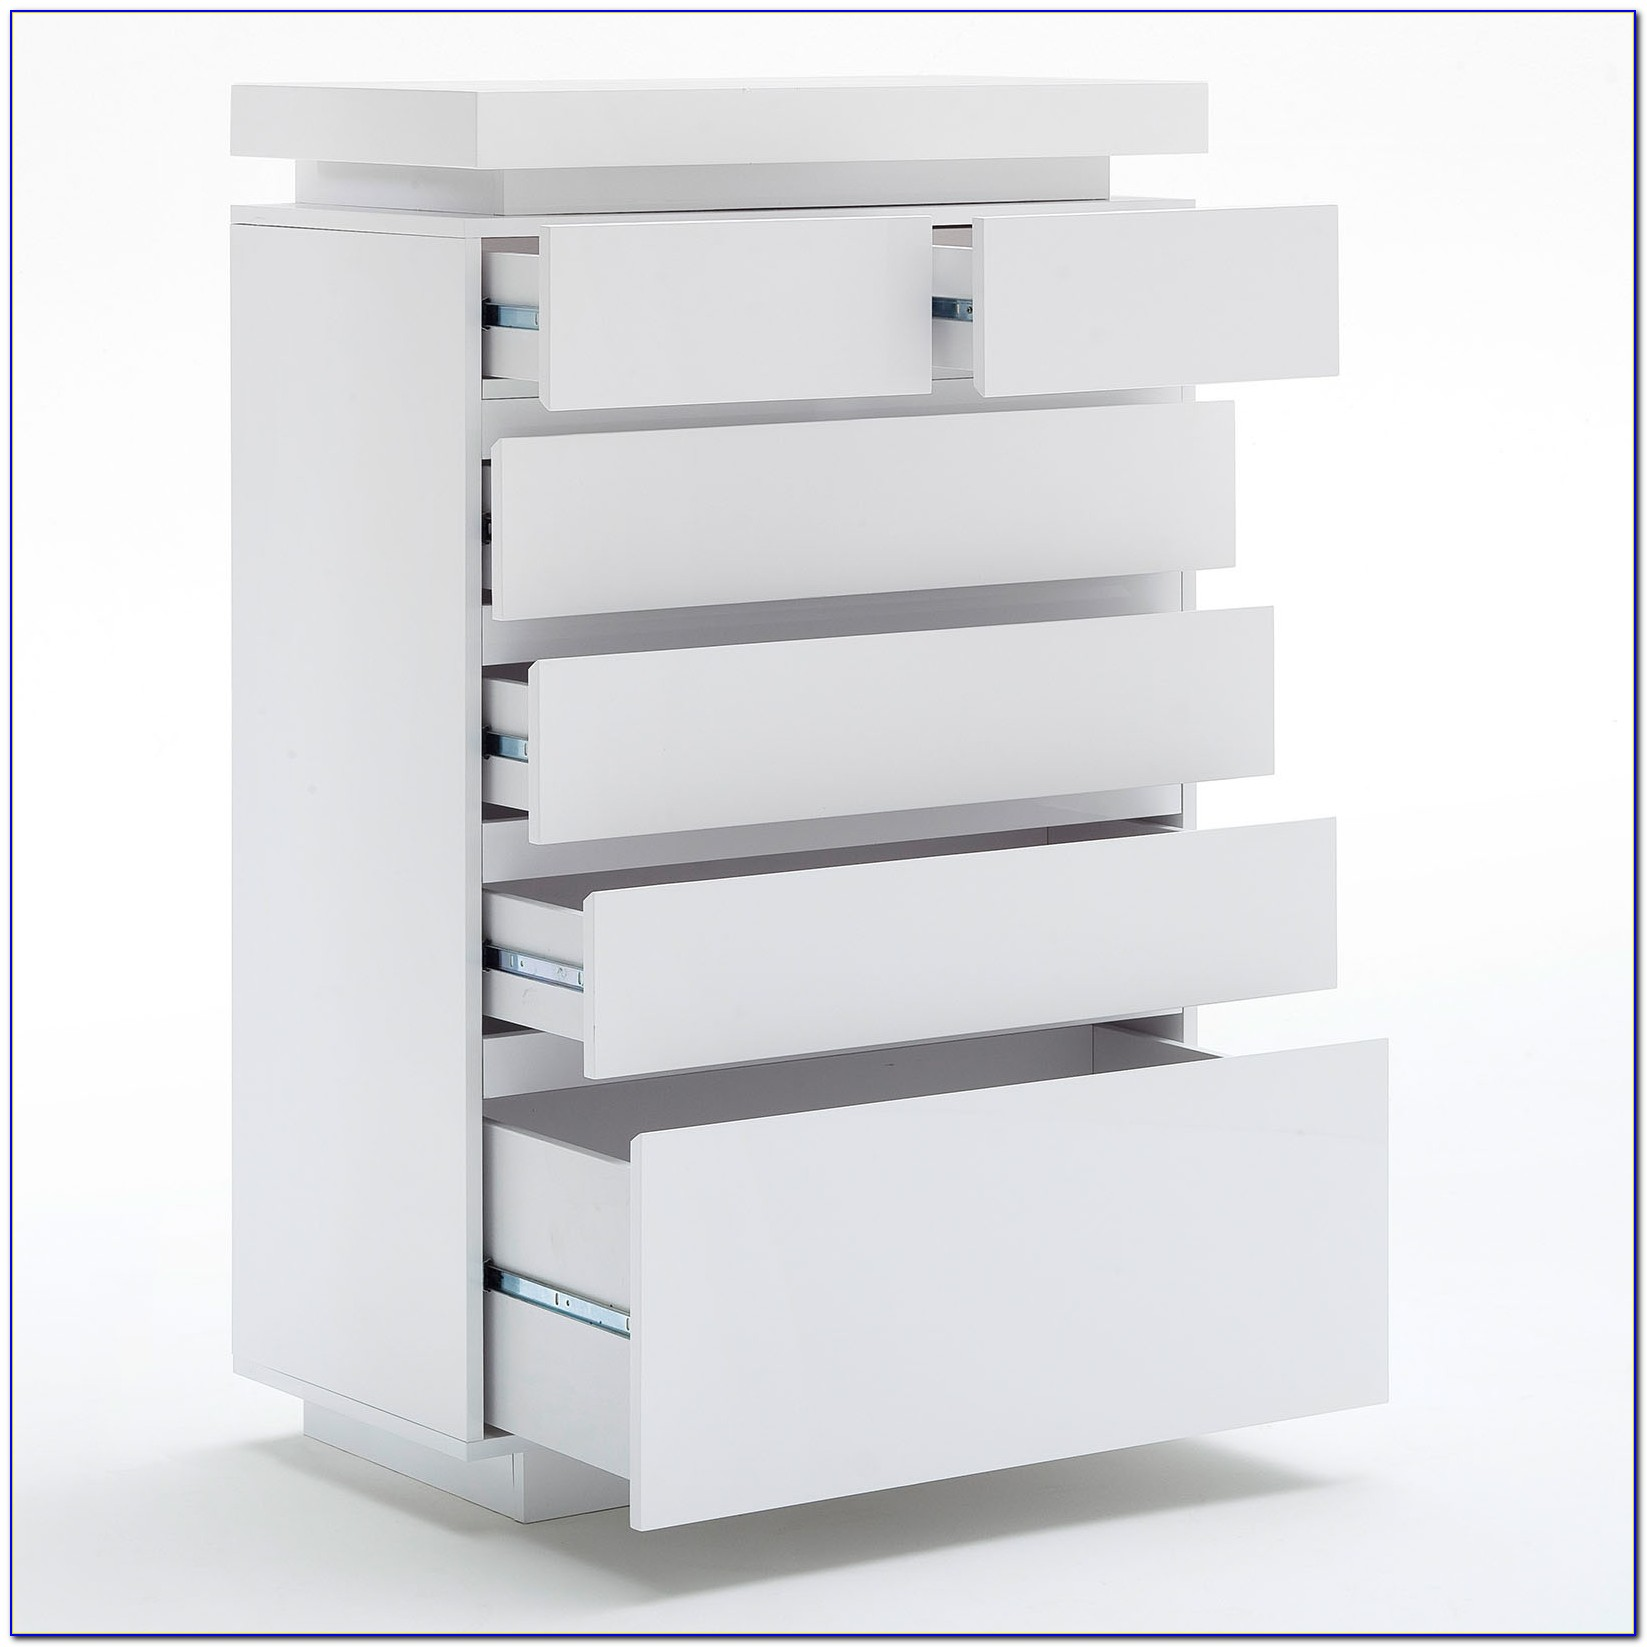 Kommode Weiß Hochglanz Ikea